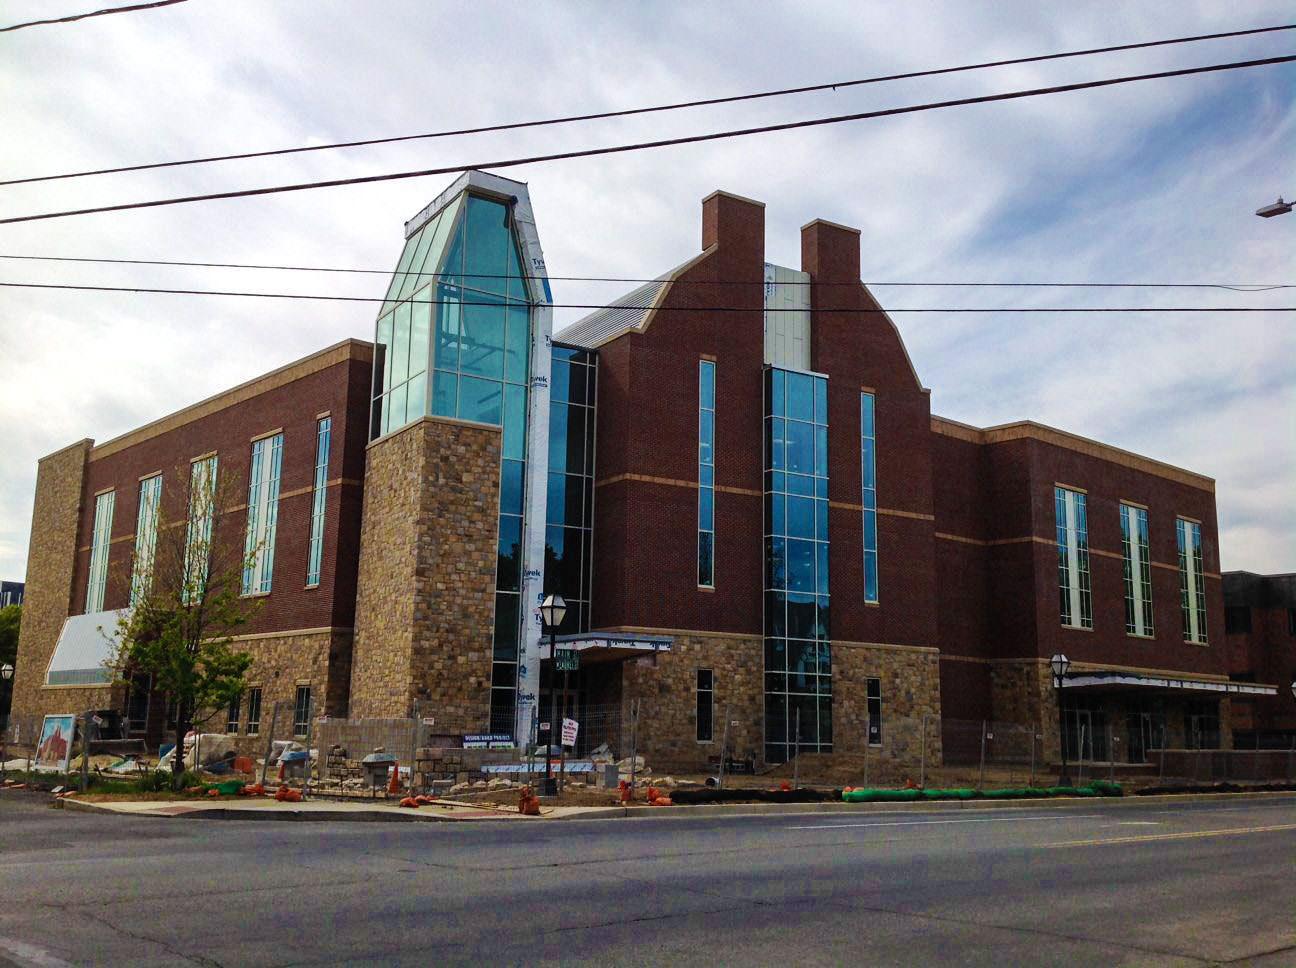 Sneak peak at Moravian College's new Sally Breidegam Miksiewicz Center for Health Sciences Building!